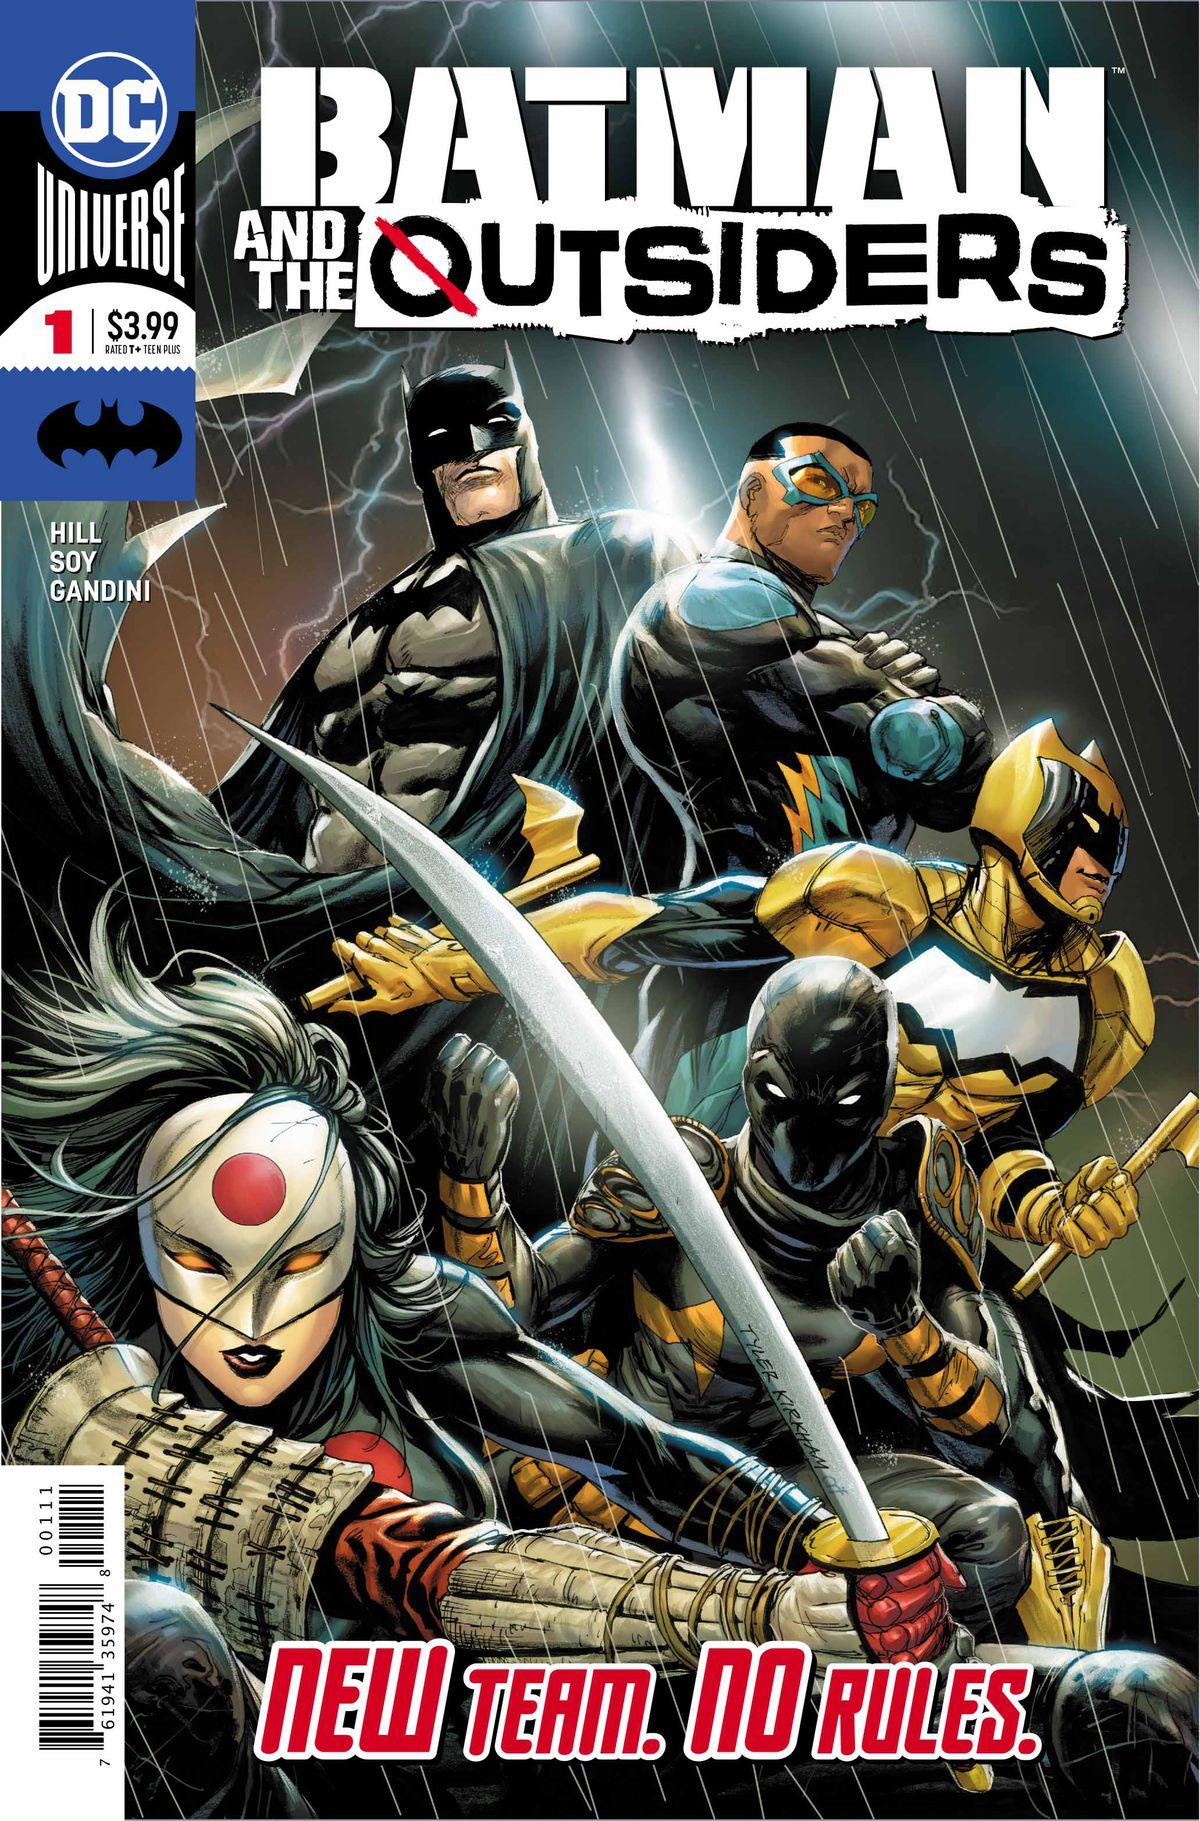 The cover of Batman & the Outsiders #1, by Top to bottom: Batman, Black Lightning, Signal, Orphan, Katana, DC Comics (2019).